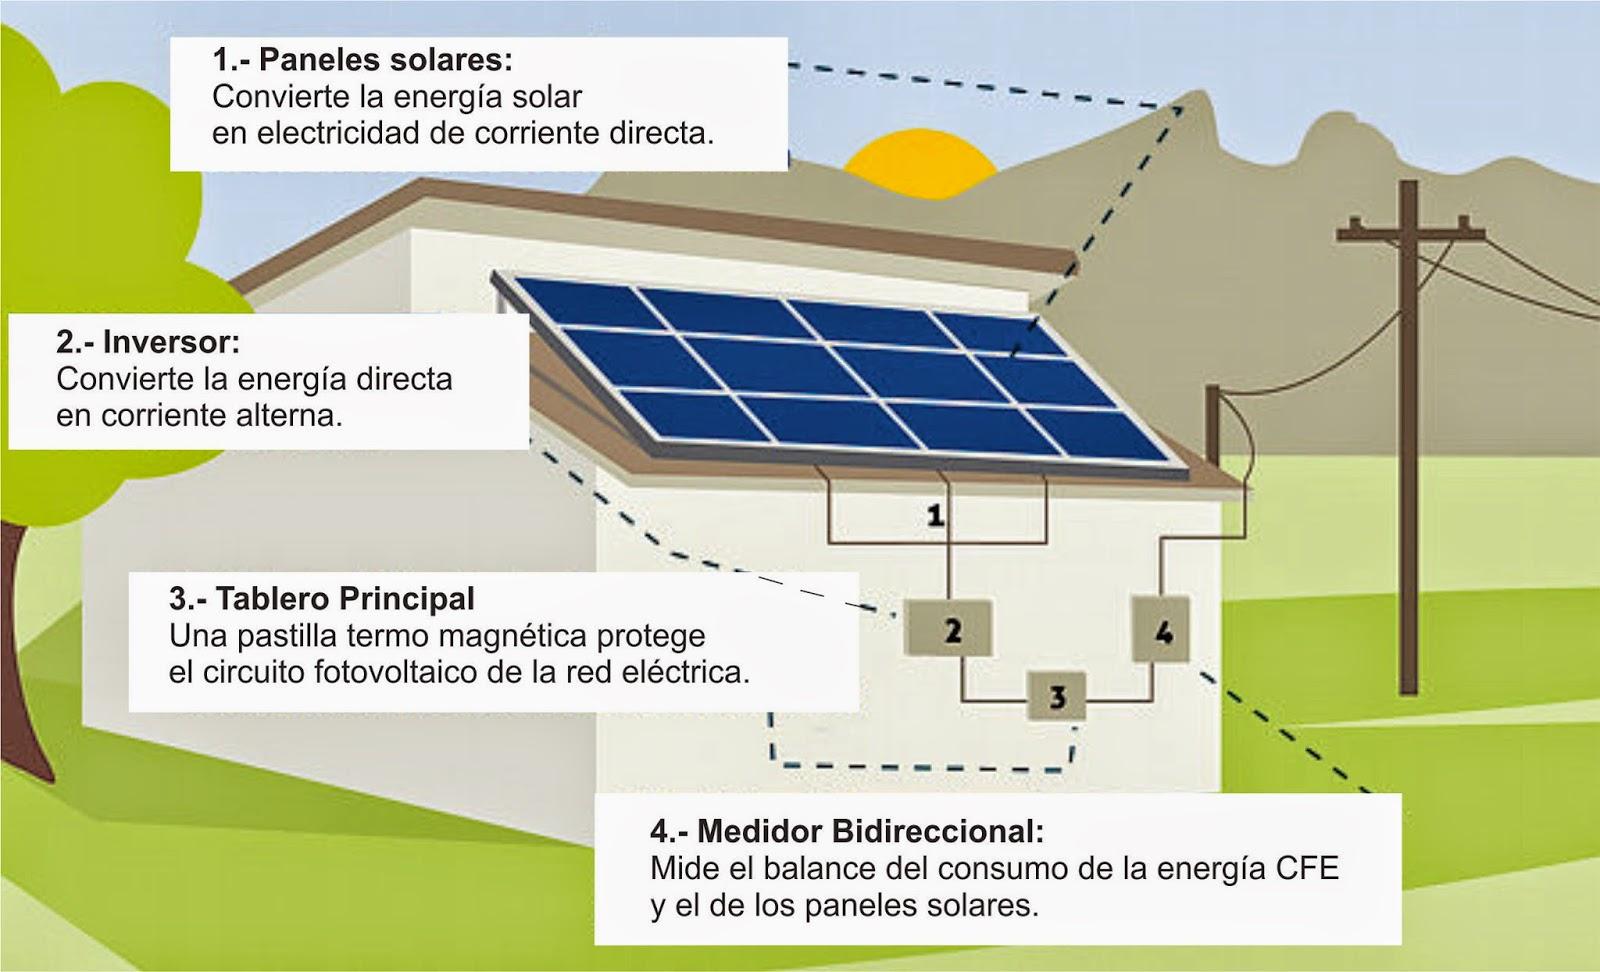 Esime generaci n 57 60 paneles solares for Montar placas solares en casa